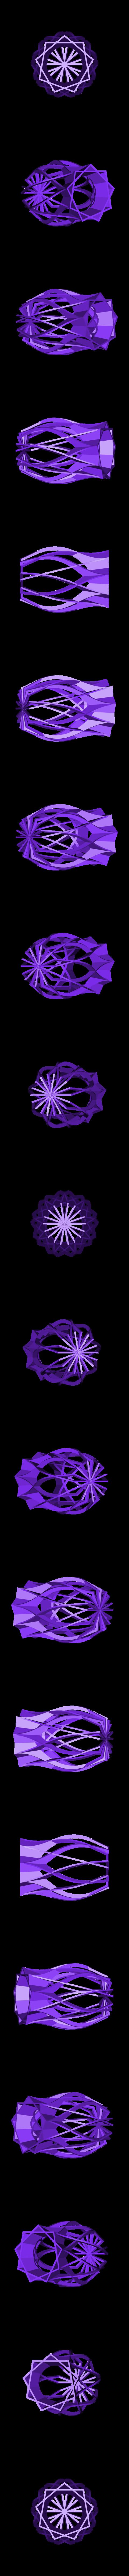 vase_exp_A03.stl Download free STL file Reasonable Vases • 3D printer design, Zippityboomba